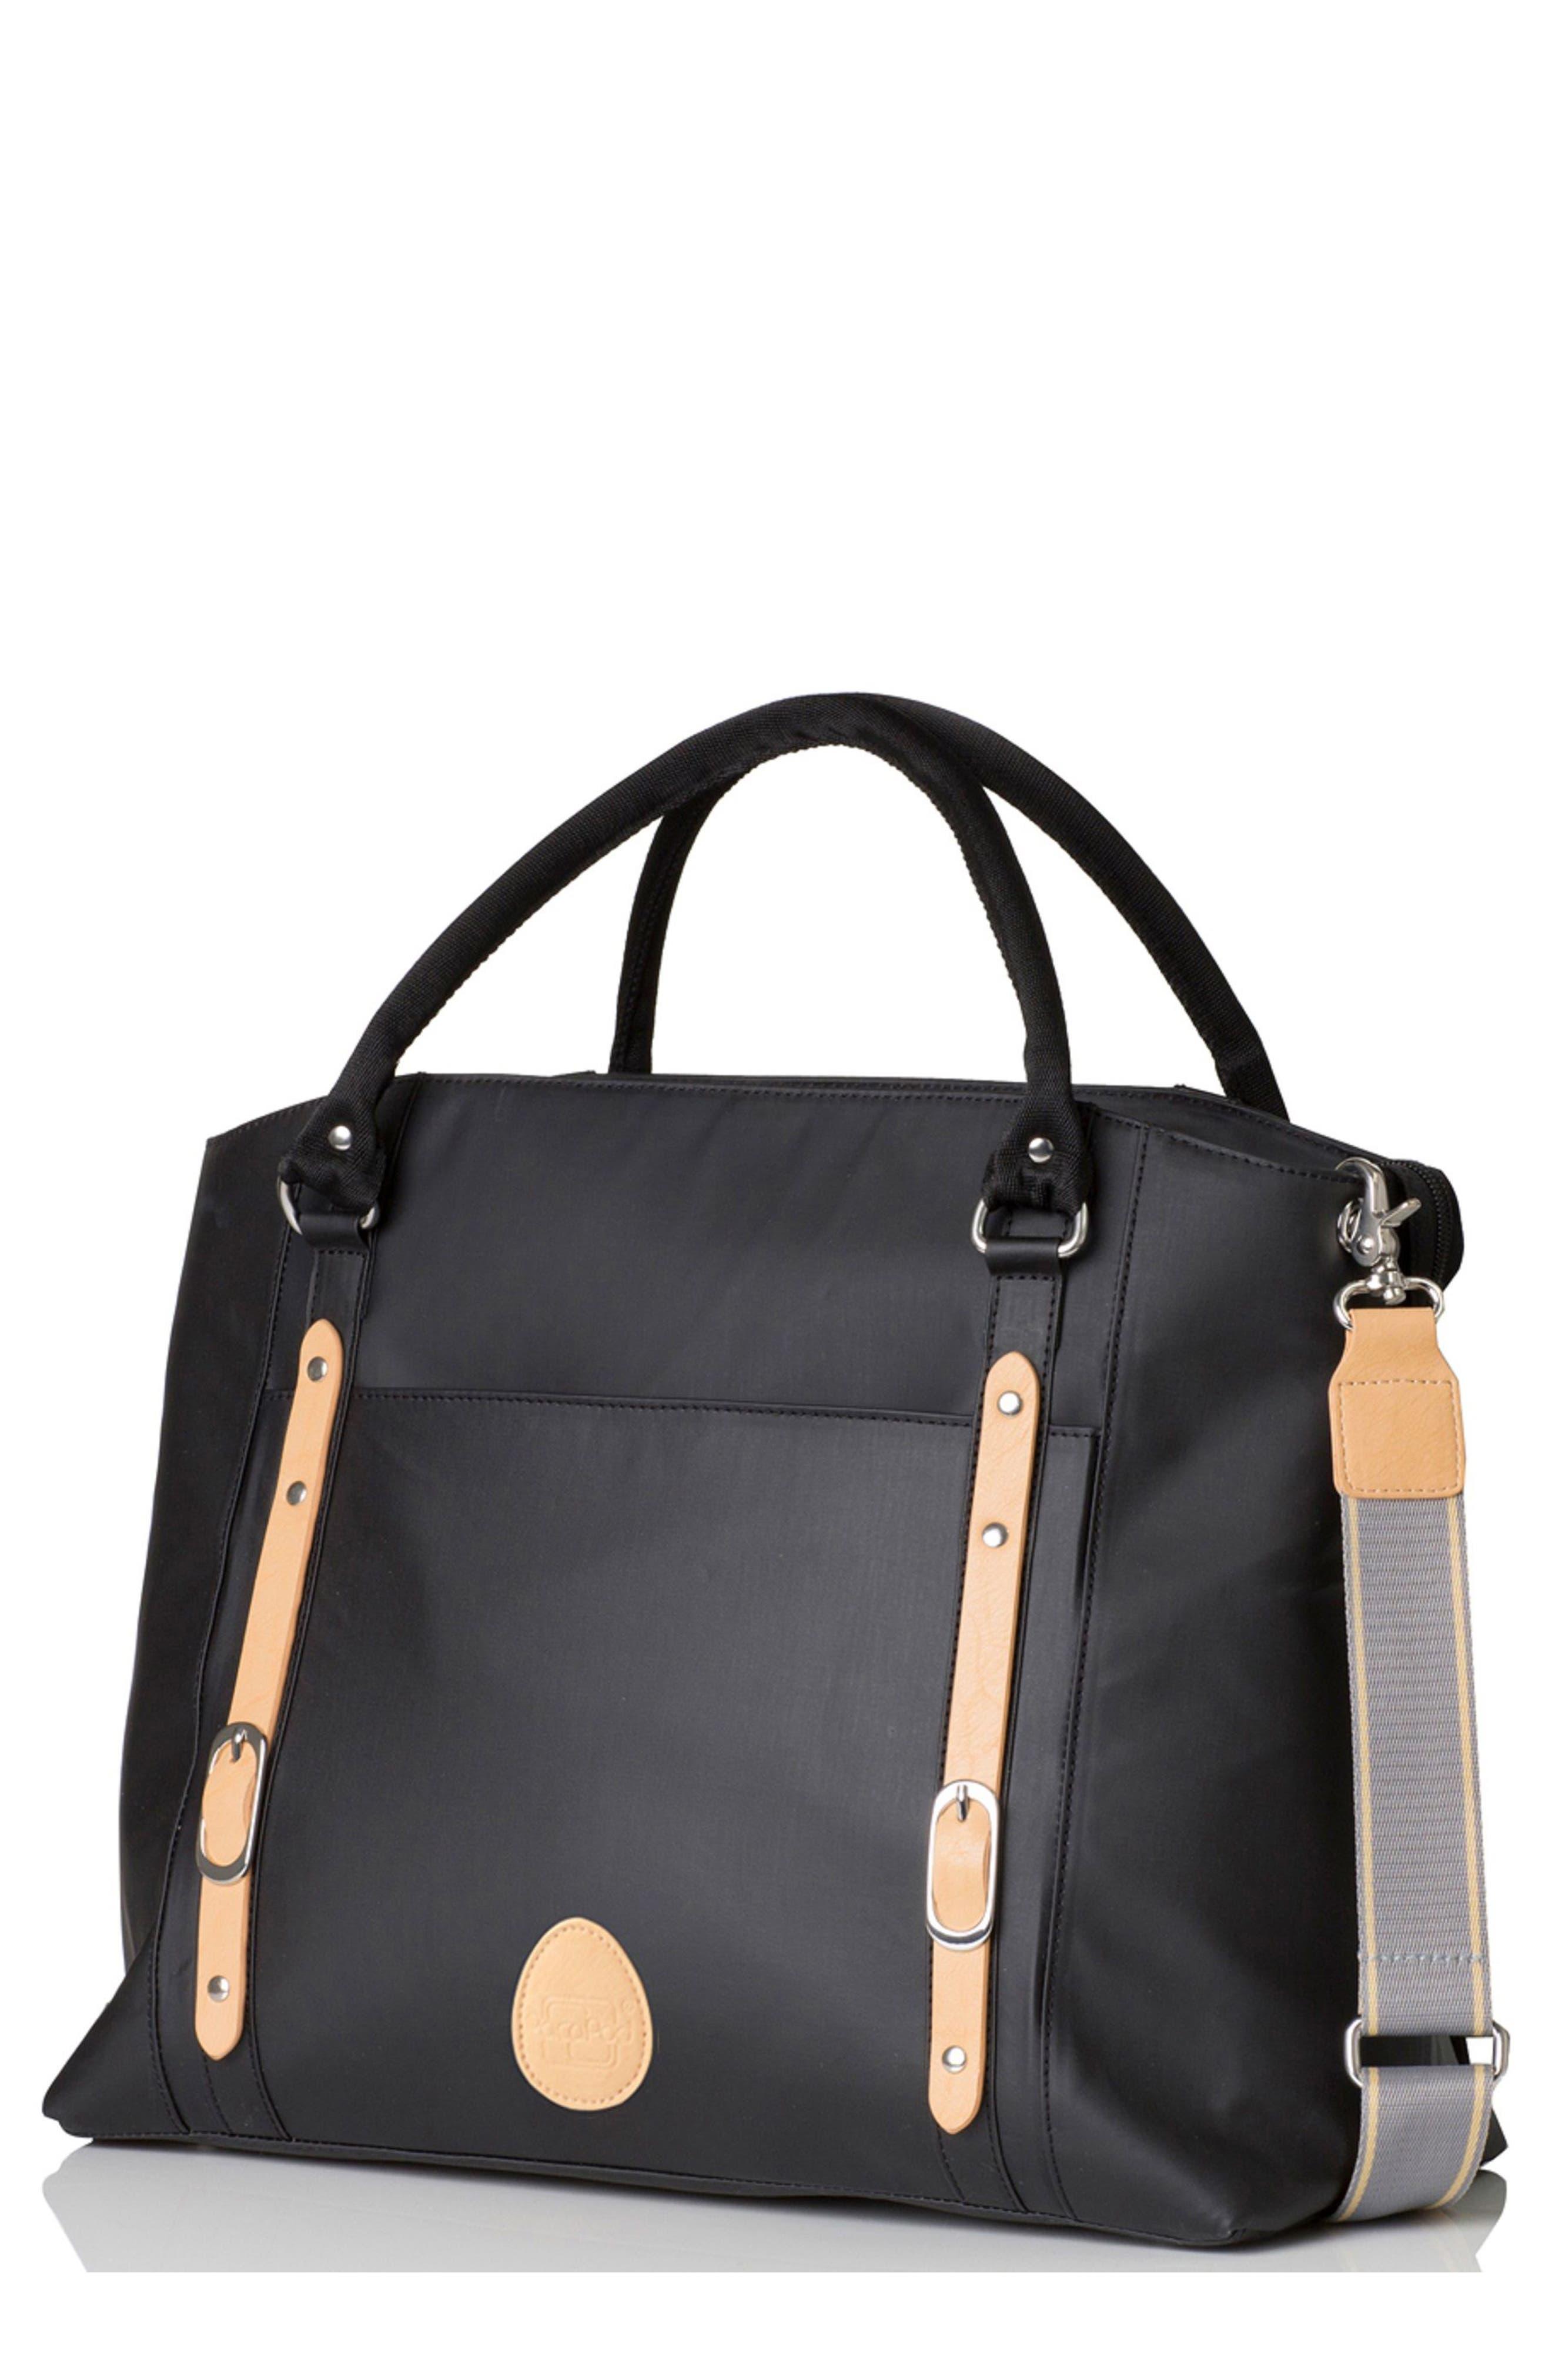 'Mirano' Diaper Bag,                             Main thumbnail 1, color,                             Black